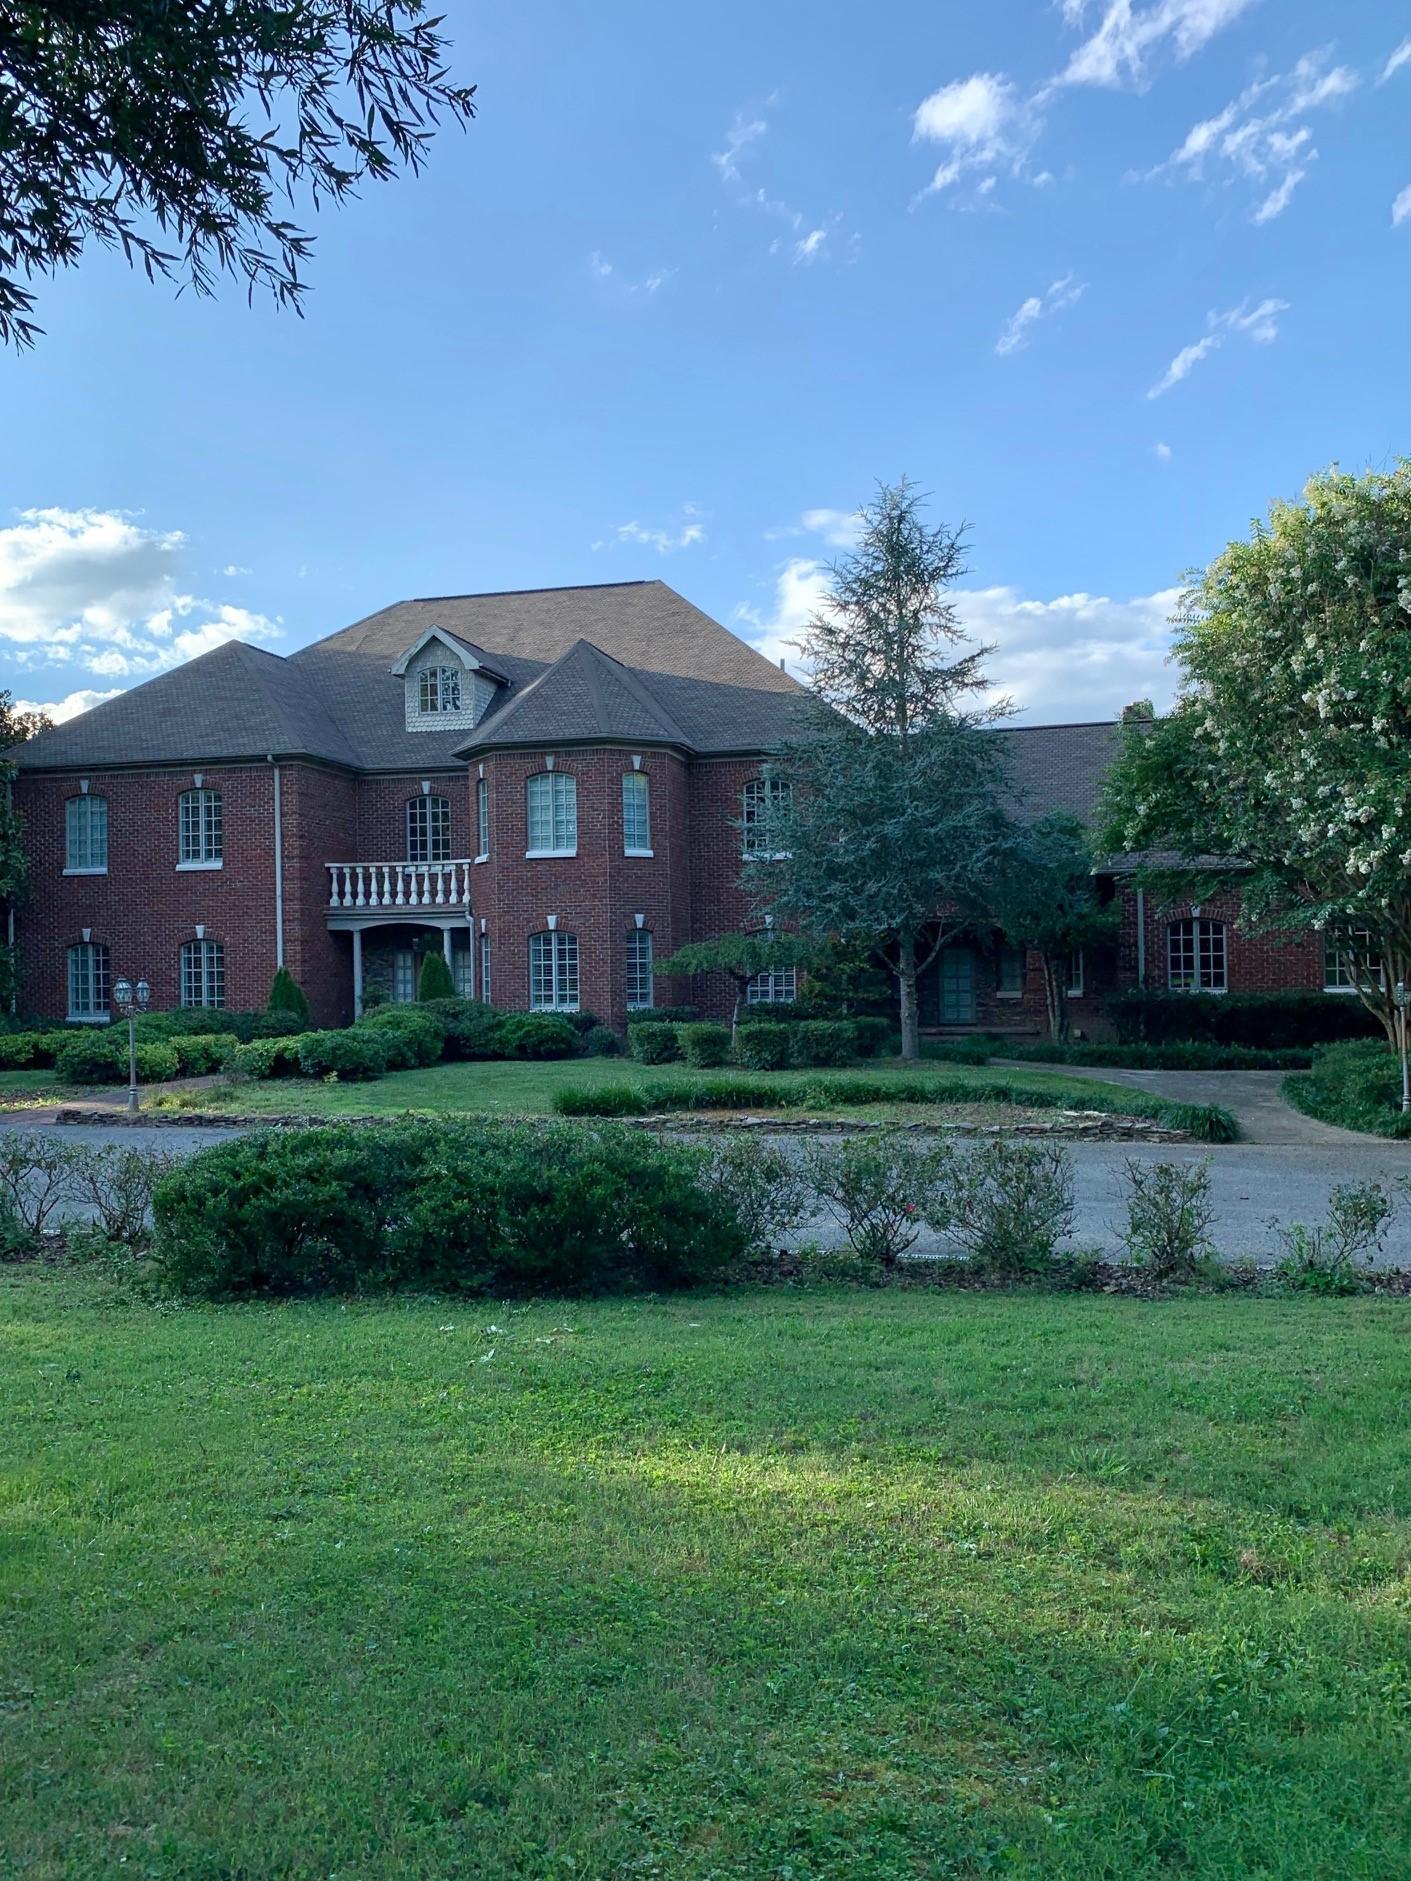 478 Greene Acres Drive, Harrogate, TN 37752